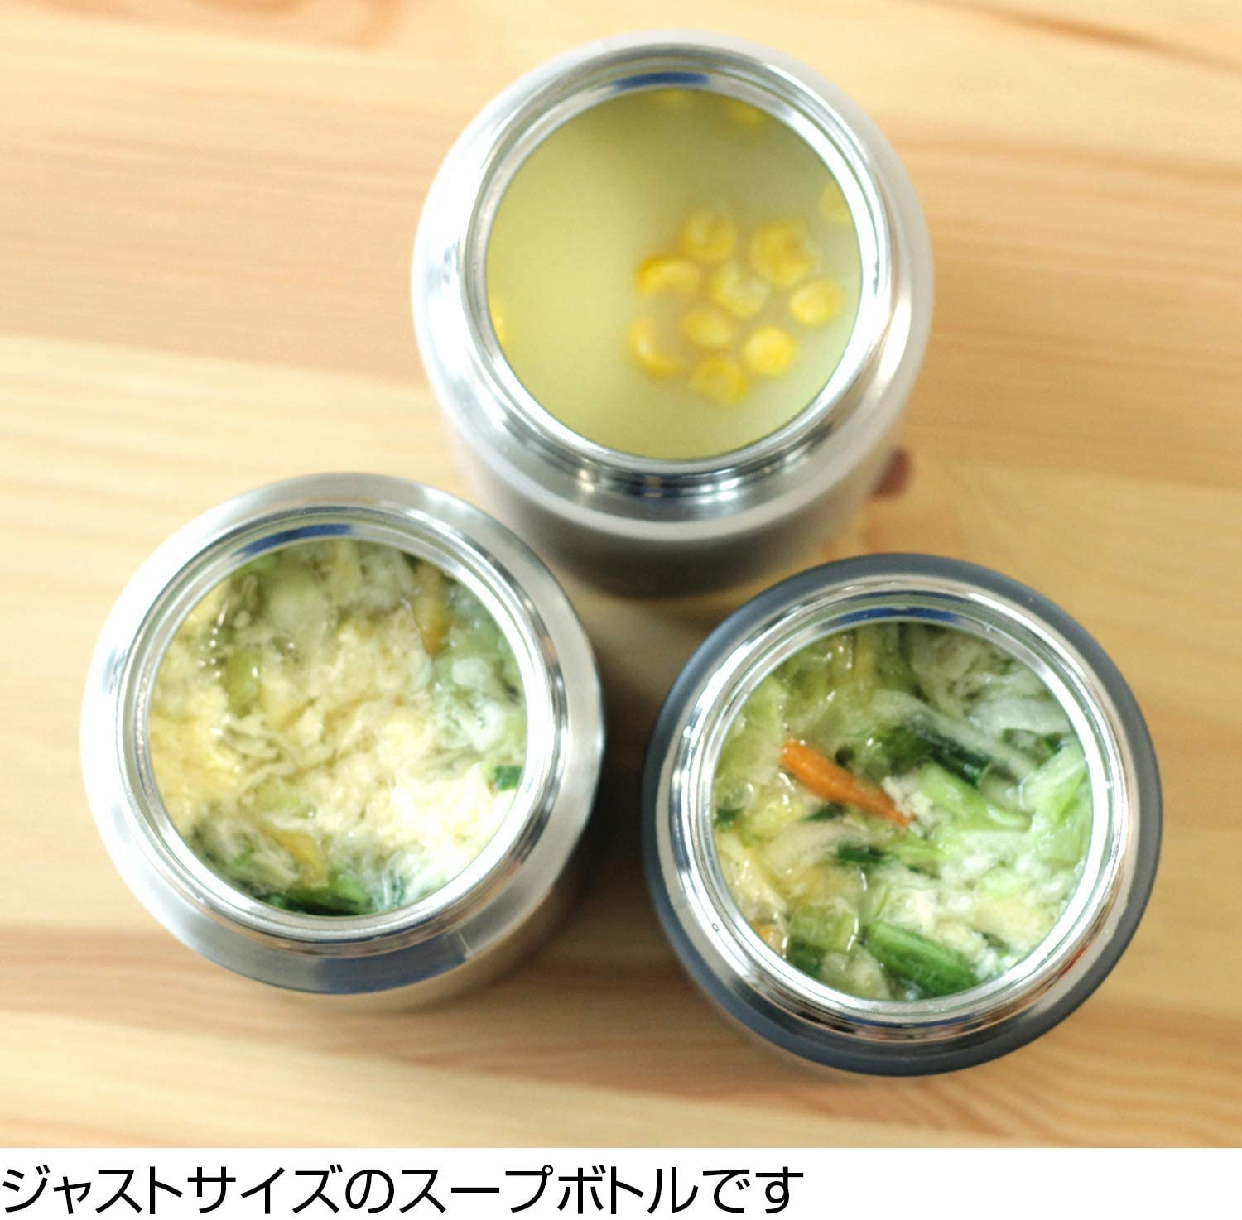 POKETLE(ポケトル)スープボトルの商品画像4